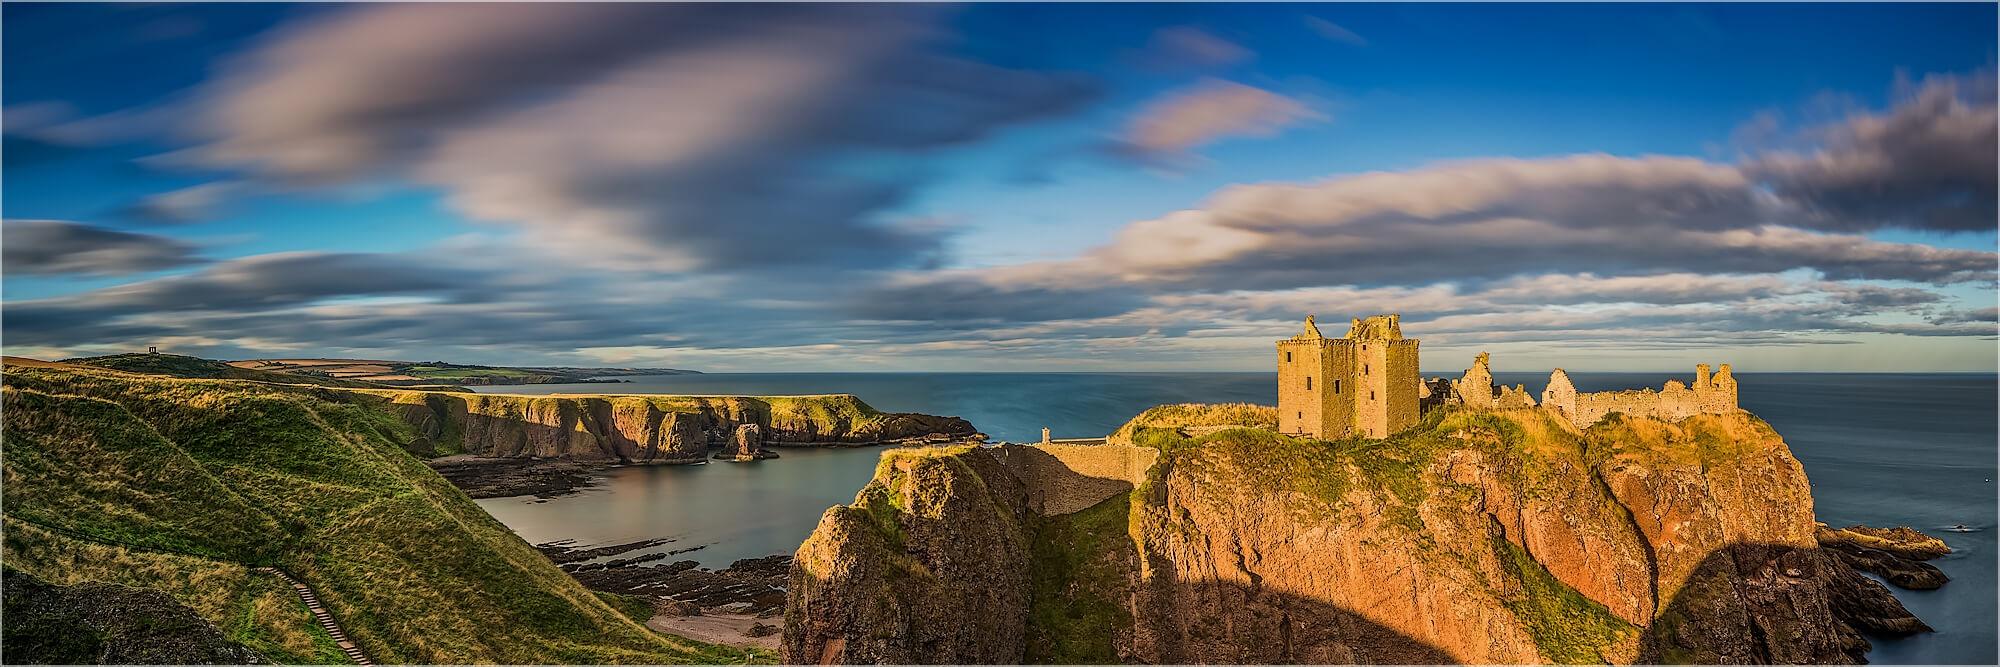 Panoramafoto Dunnottar Castle Stonehaven Schottland